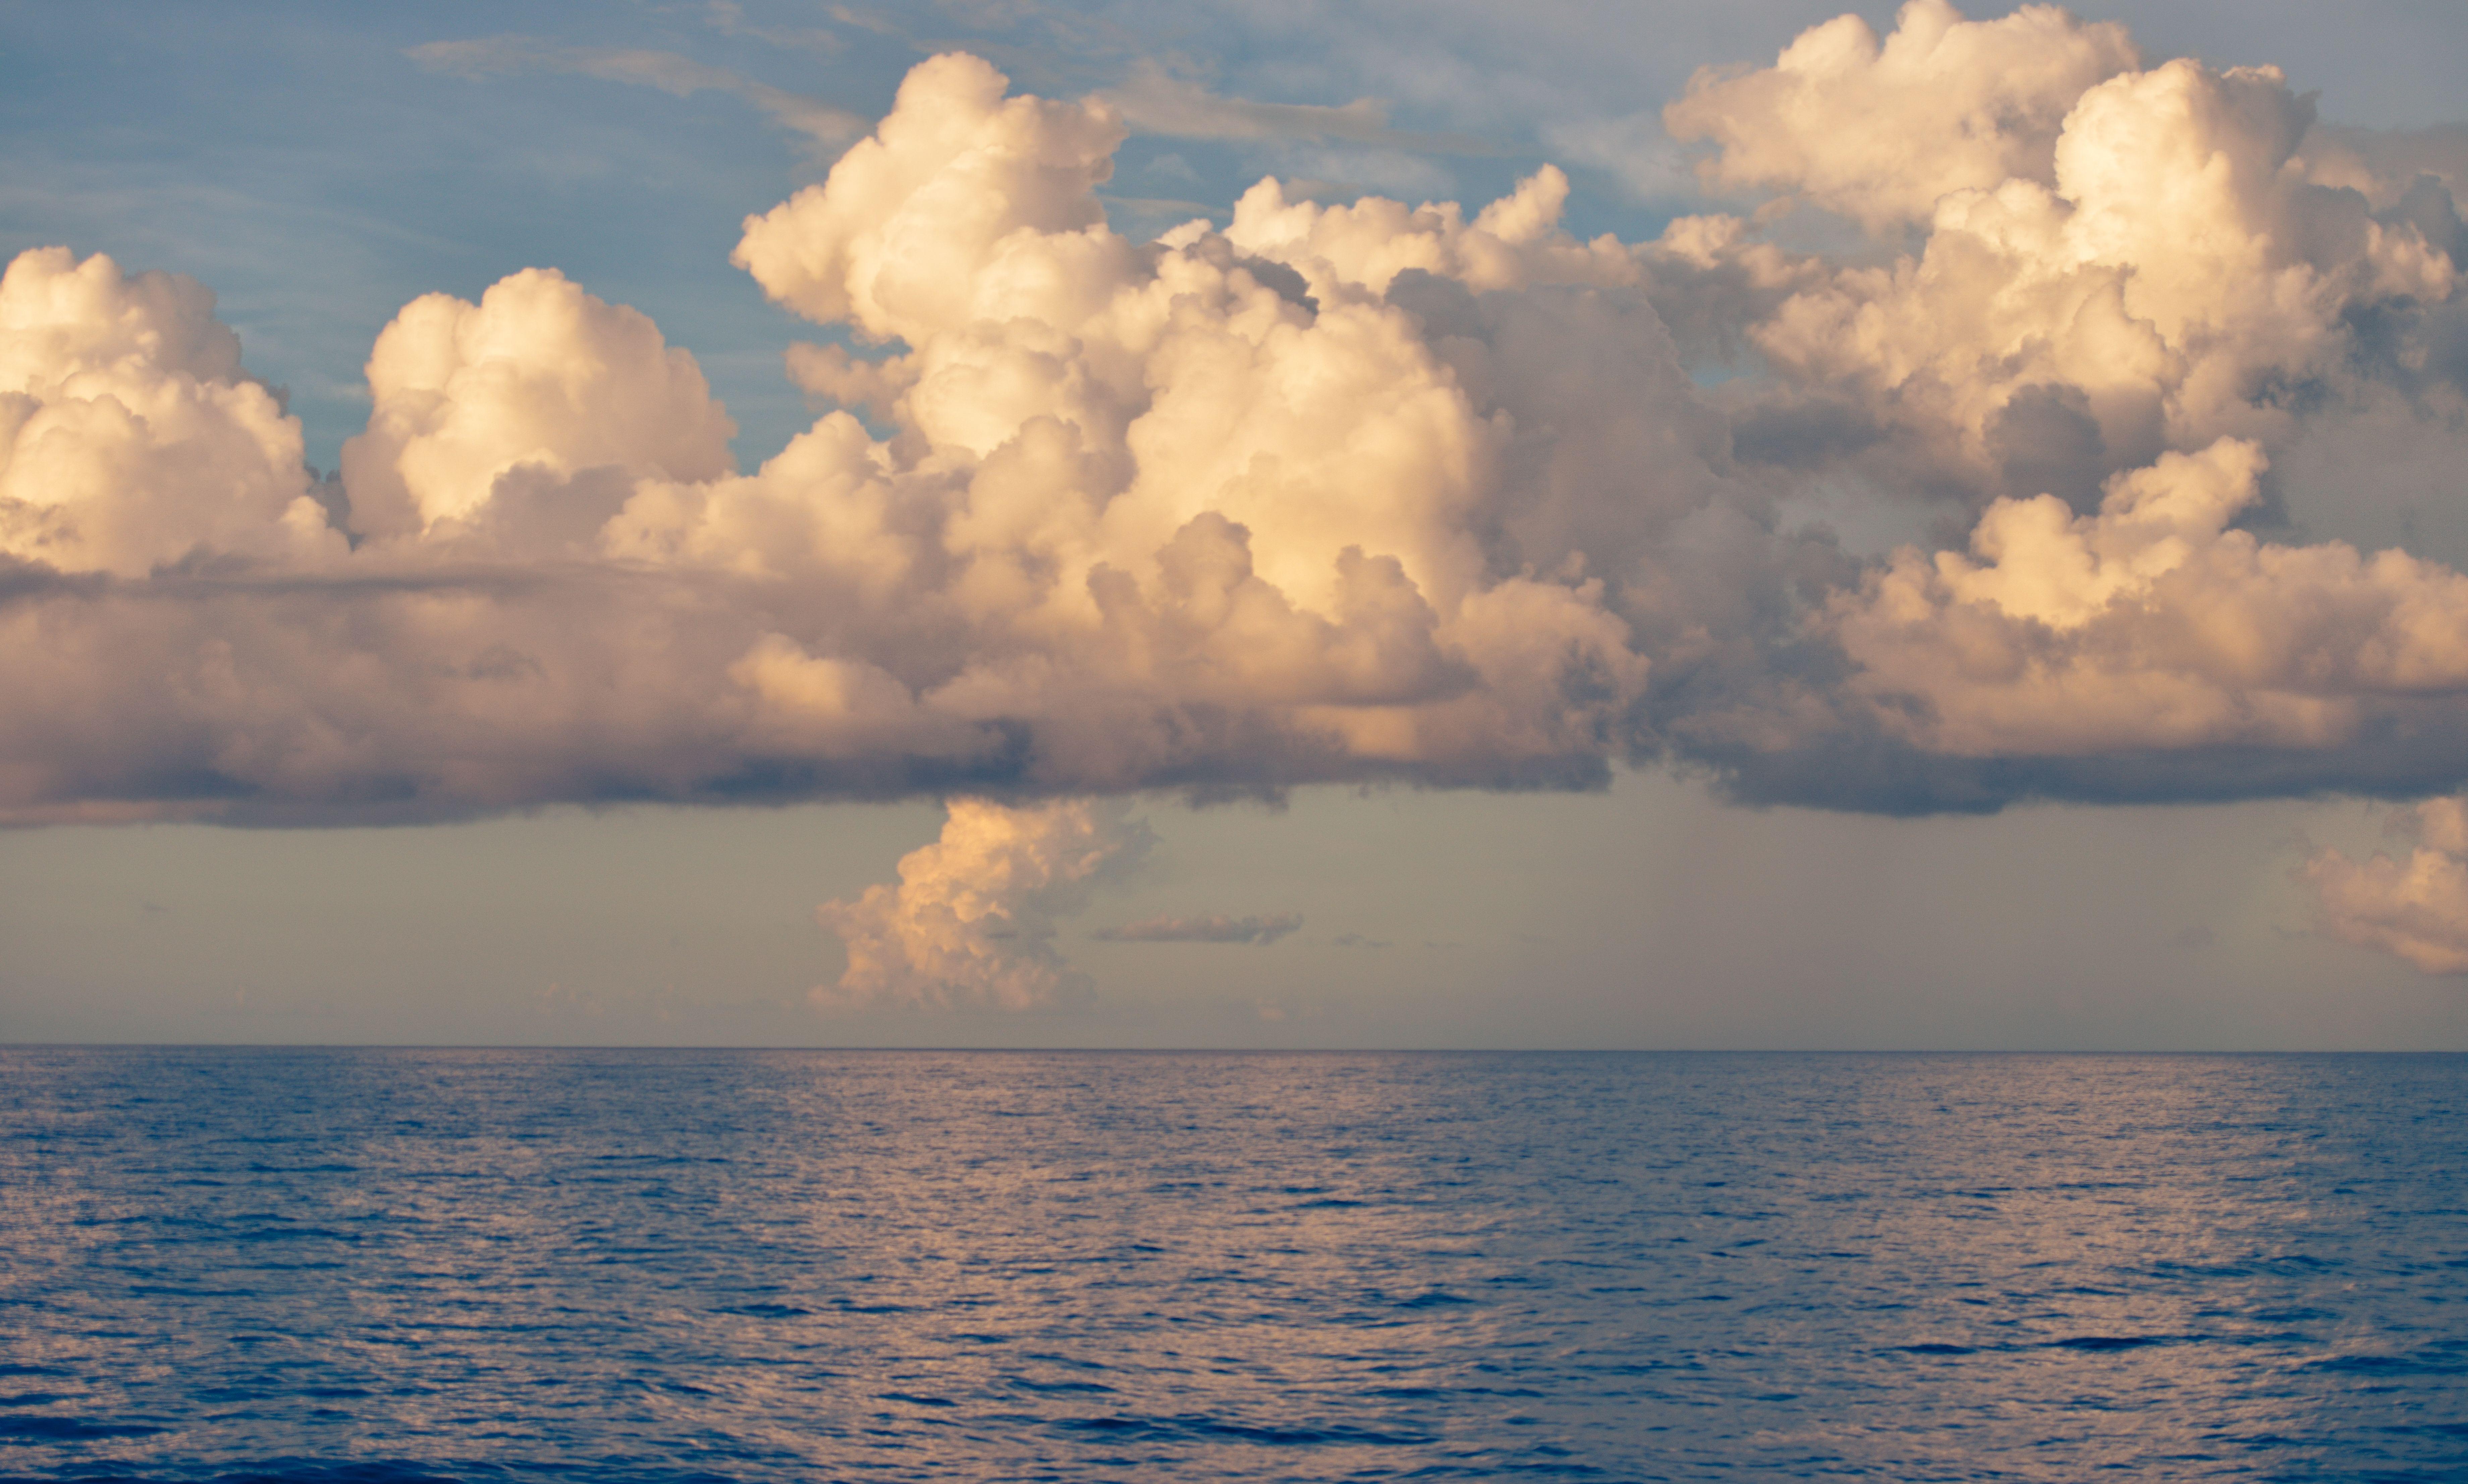 sea-sky-clouds-weather.jpg (7360×4426)